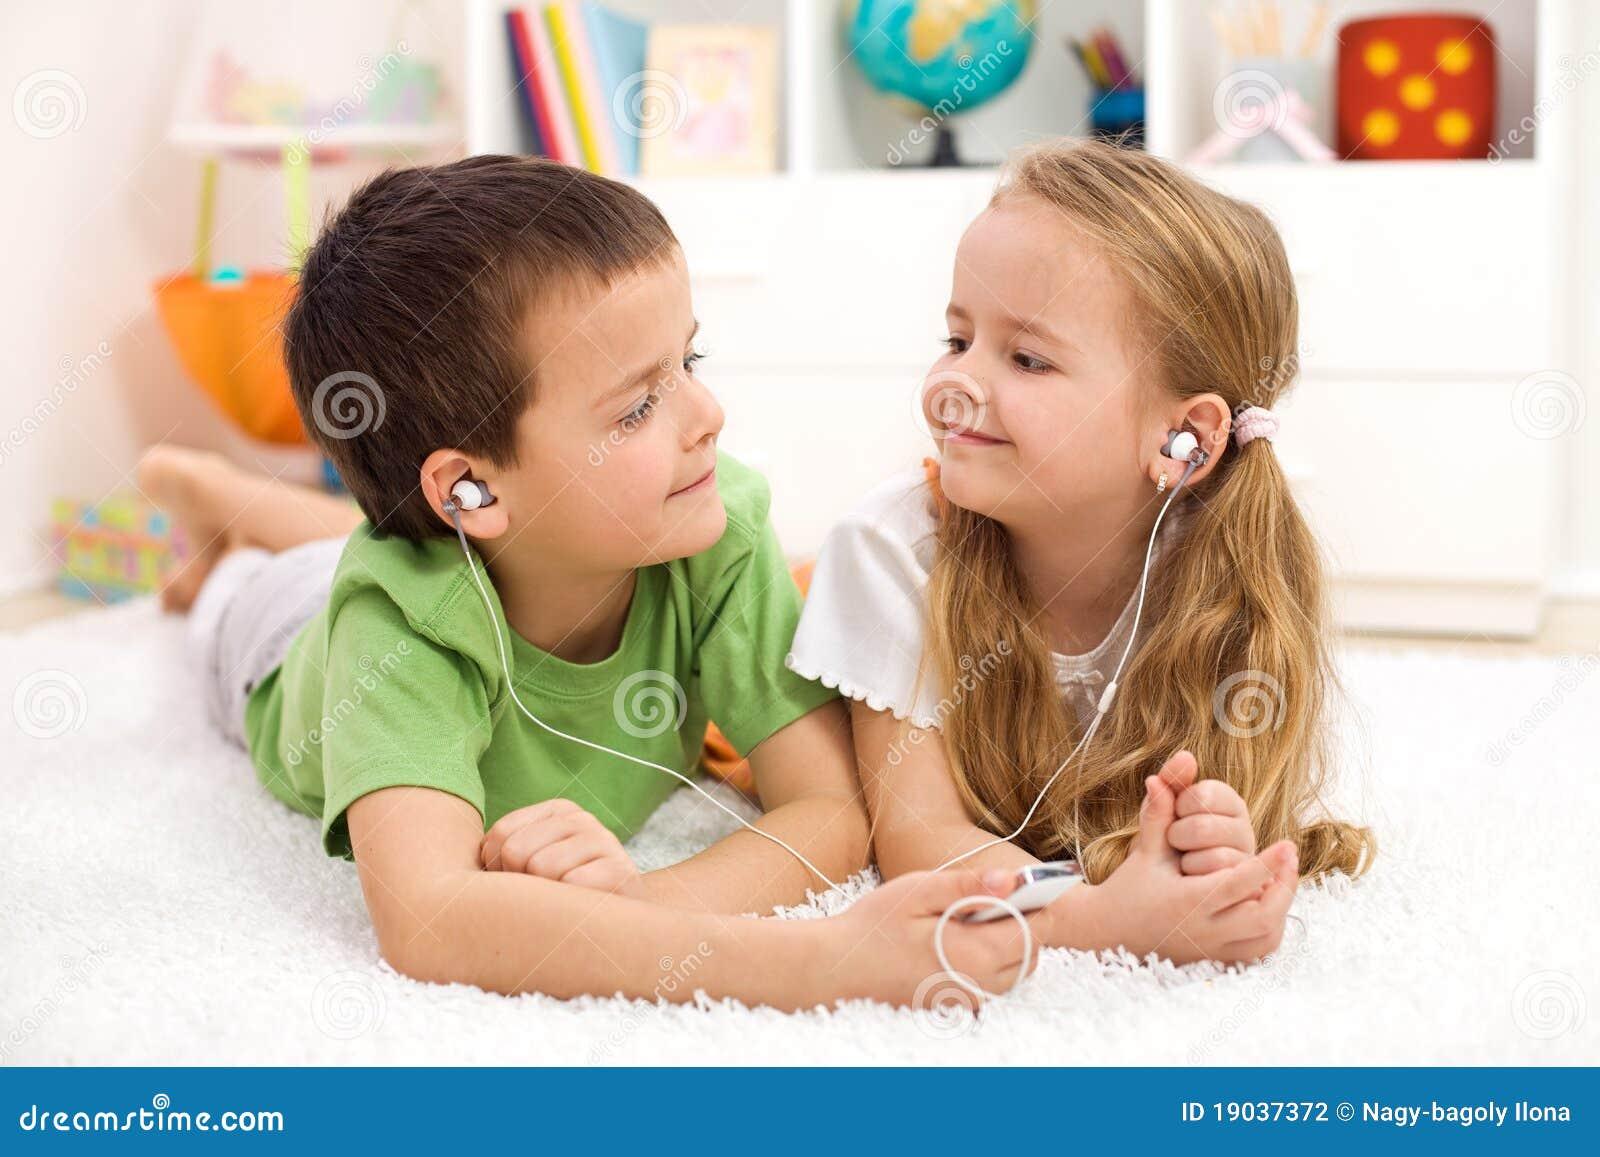 Kids sharing earphones listening to music